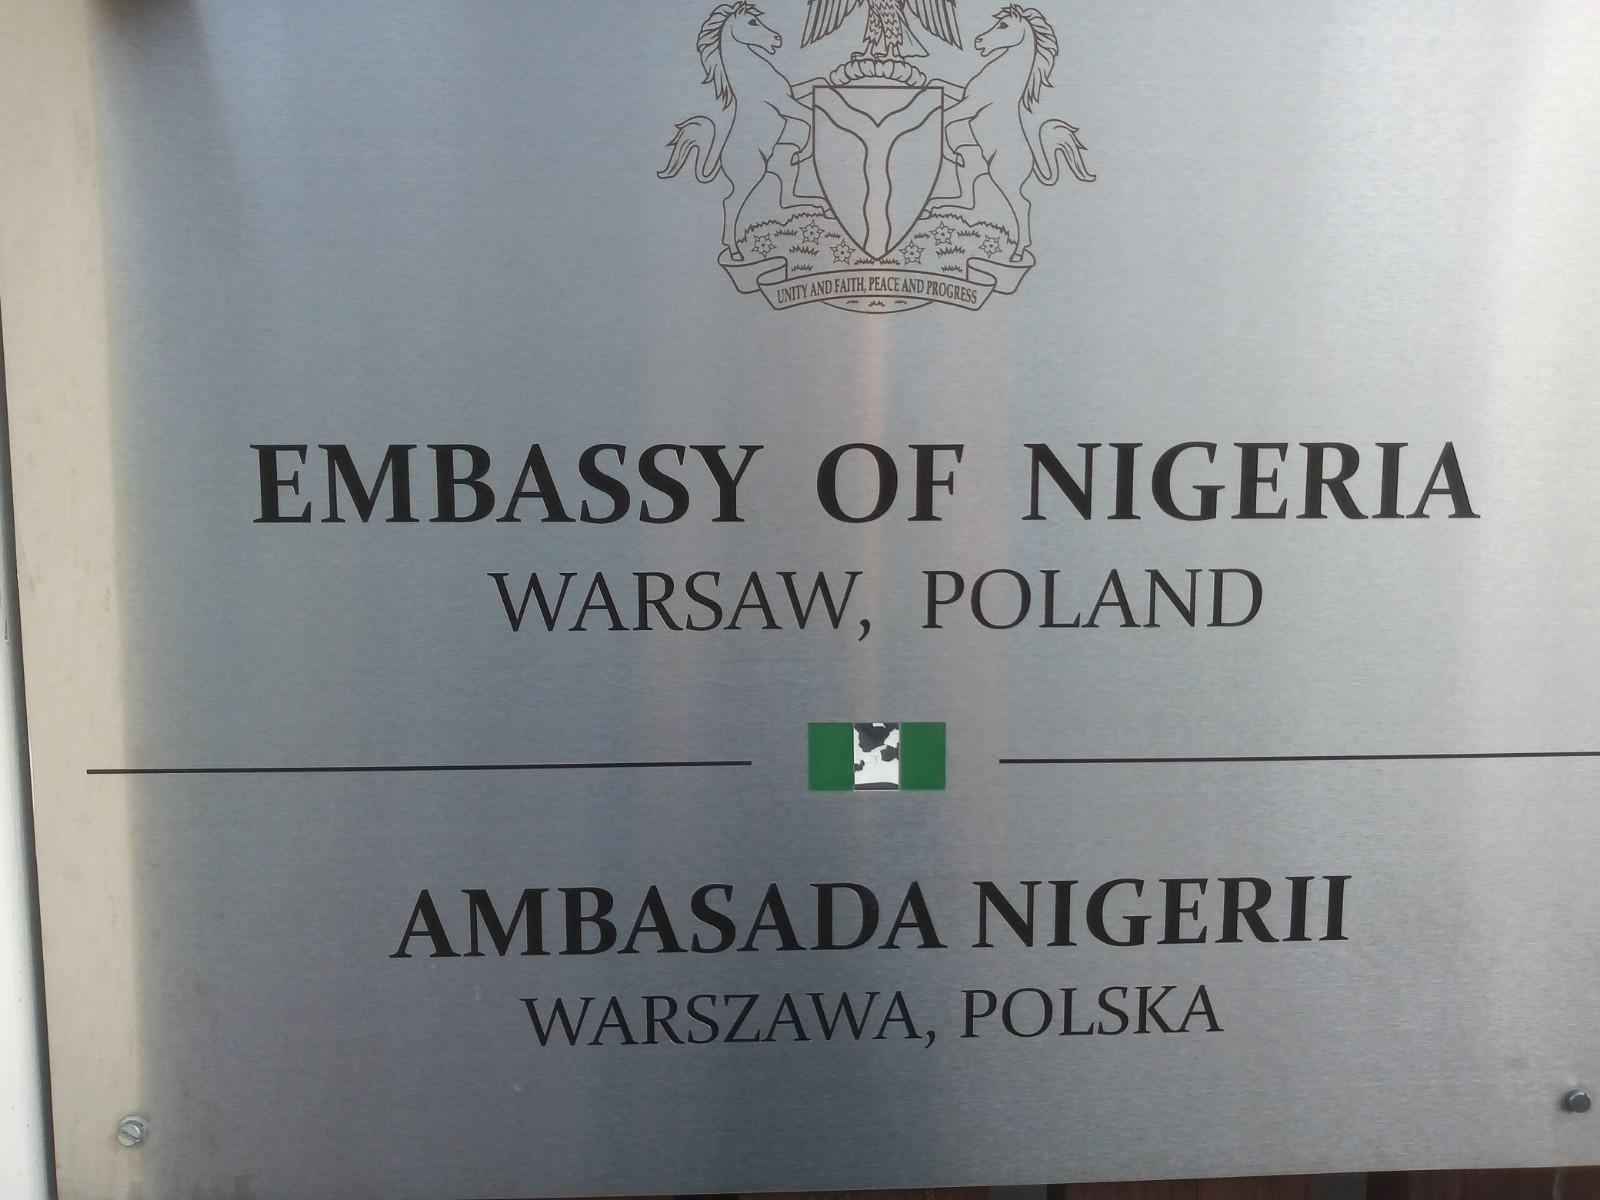 Ambasada Nigerii